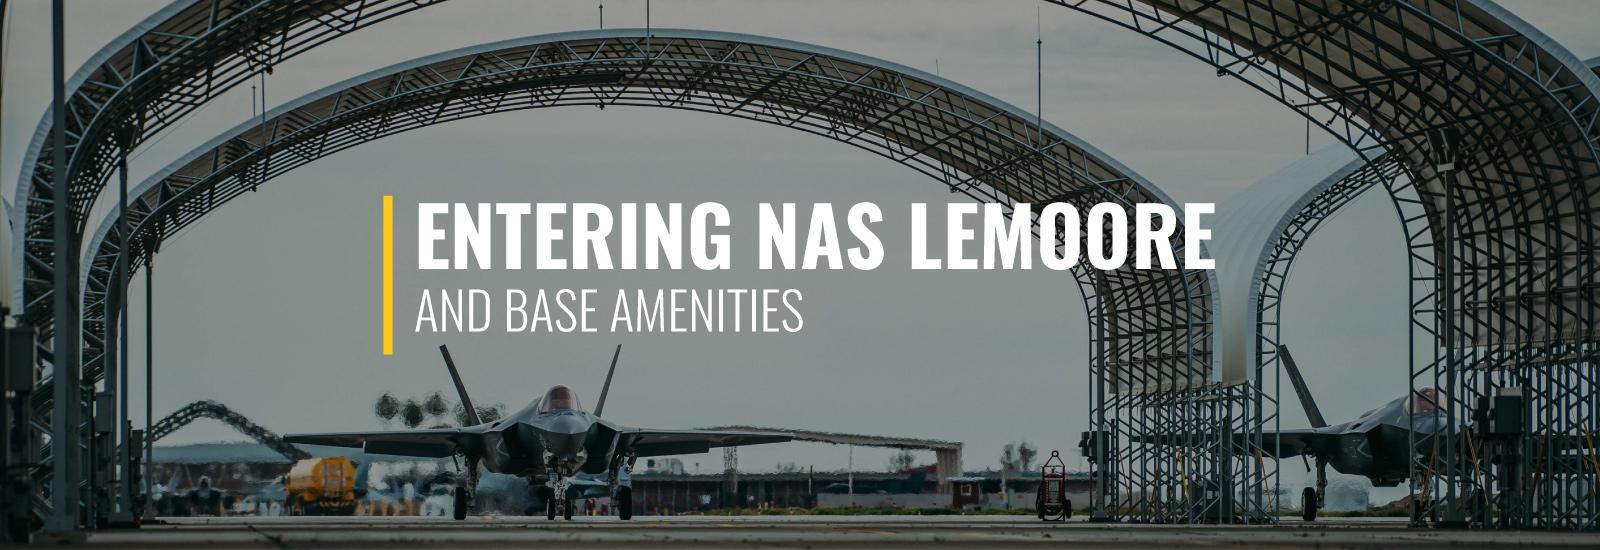 Entering NAS Lemoore and Base Amenities